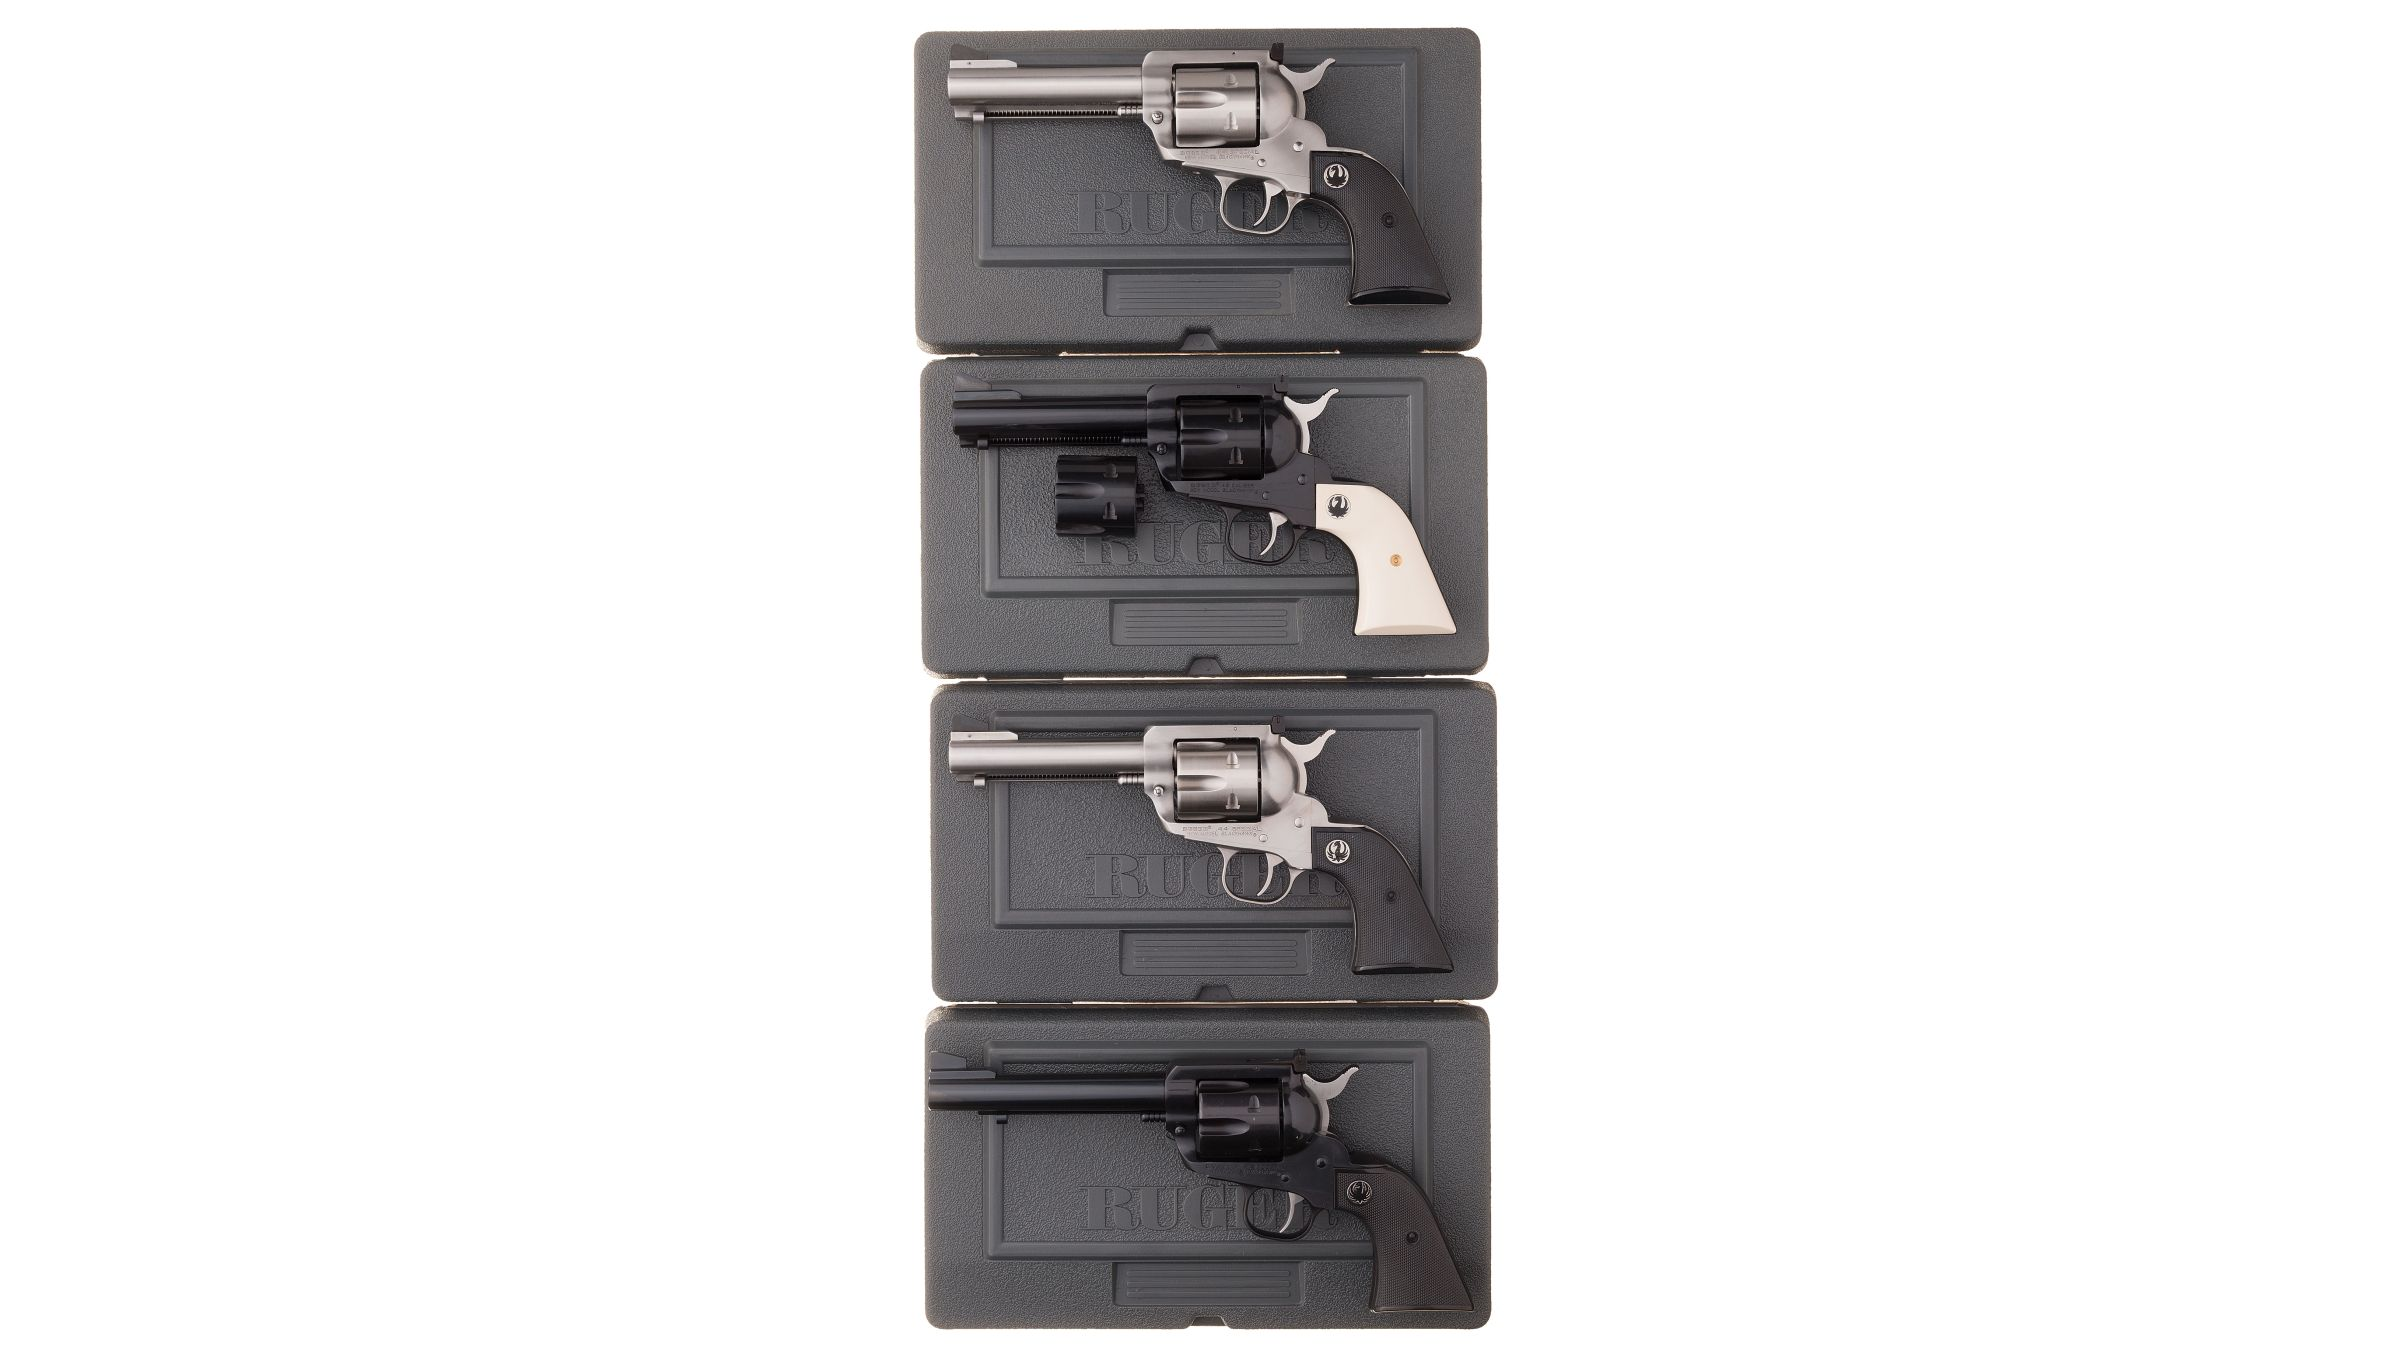 Four Ruger New Model Blackhawk Single Action Revolvers